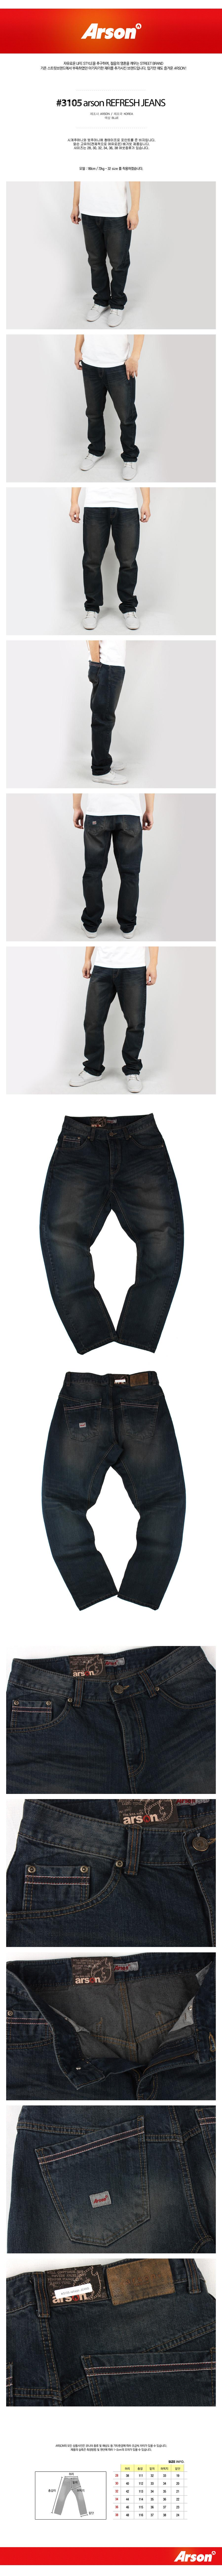 [ ARSON ] [纵火]真正的纵火案刷新 3105 牛仔裤男牛仔裤牛仔裤牛仔裤的纵火案